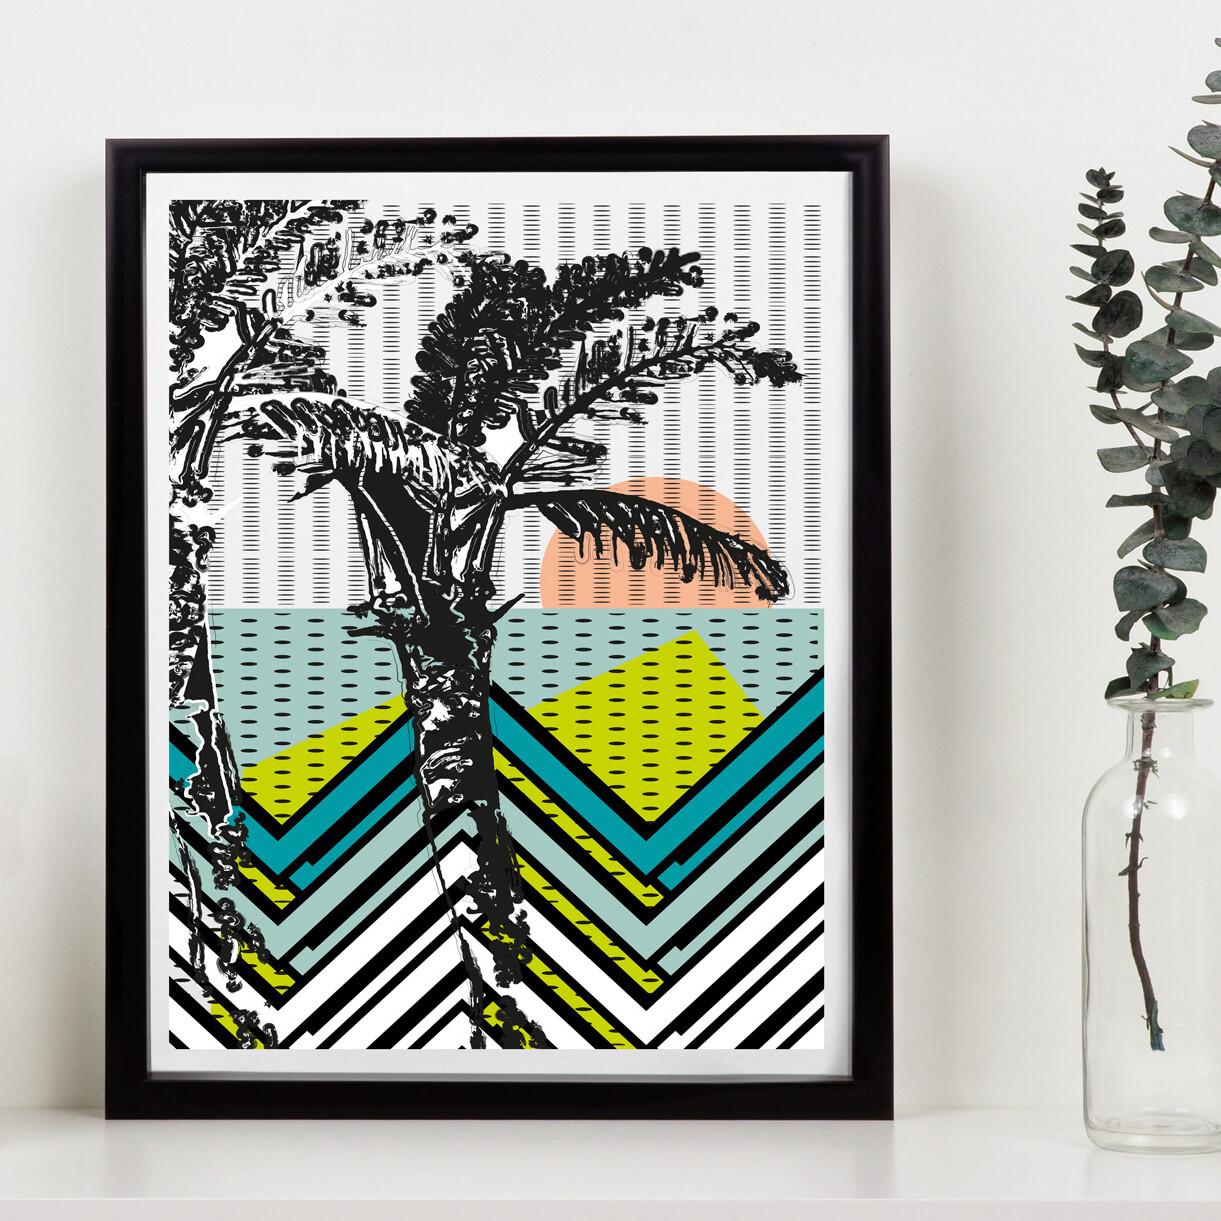 Sandy Beach // 150 Limited Edition // Eco-conscious print // 11x14 inch